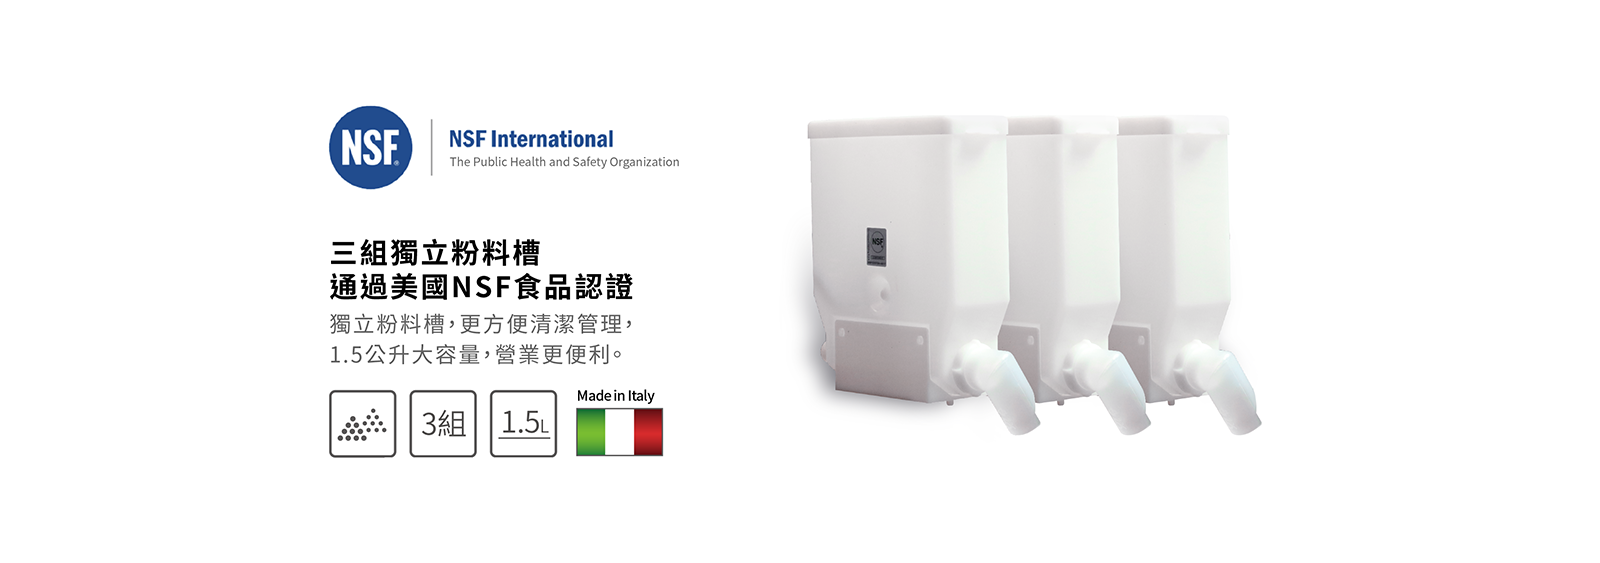 CoCoCafe無人咖啡機-ai1000-h粉料槽